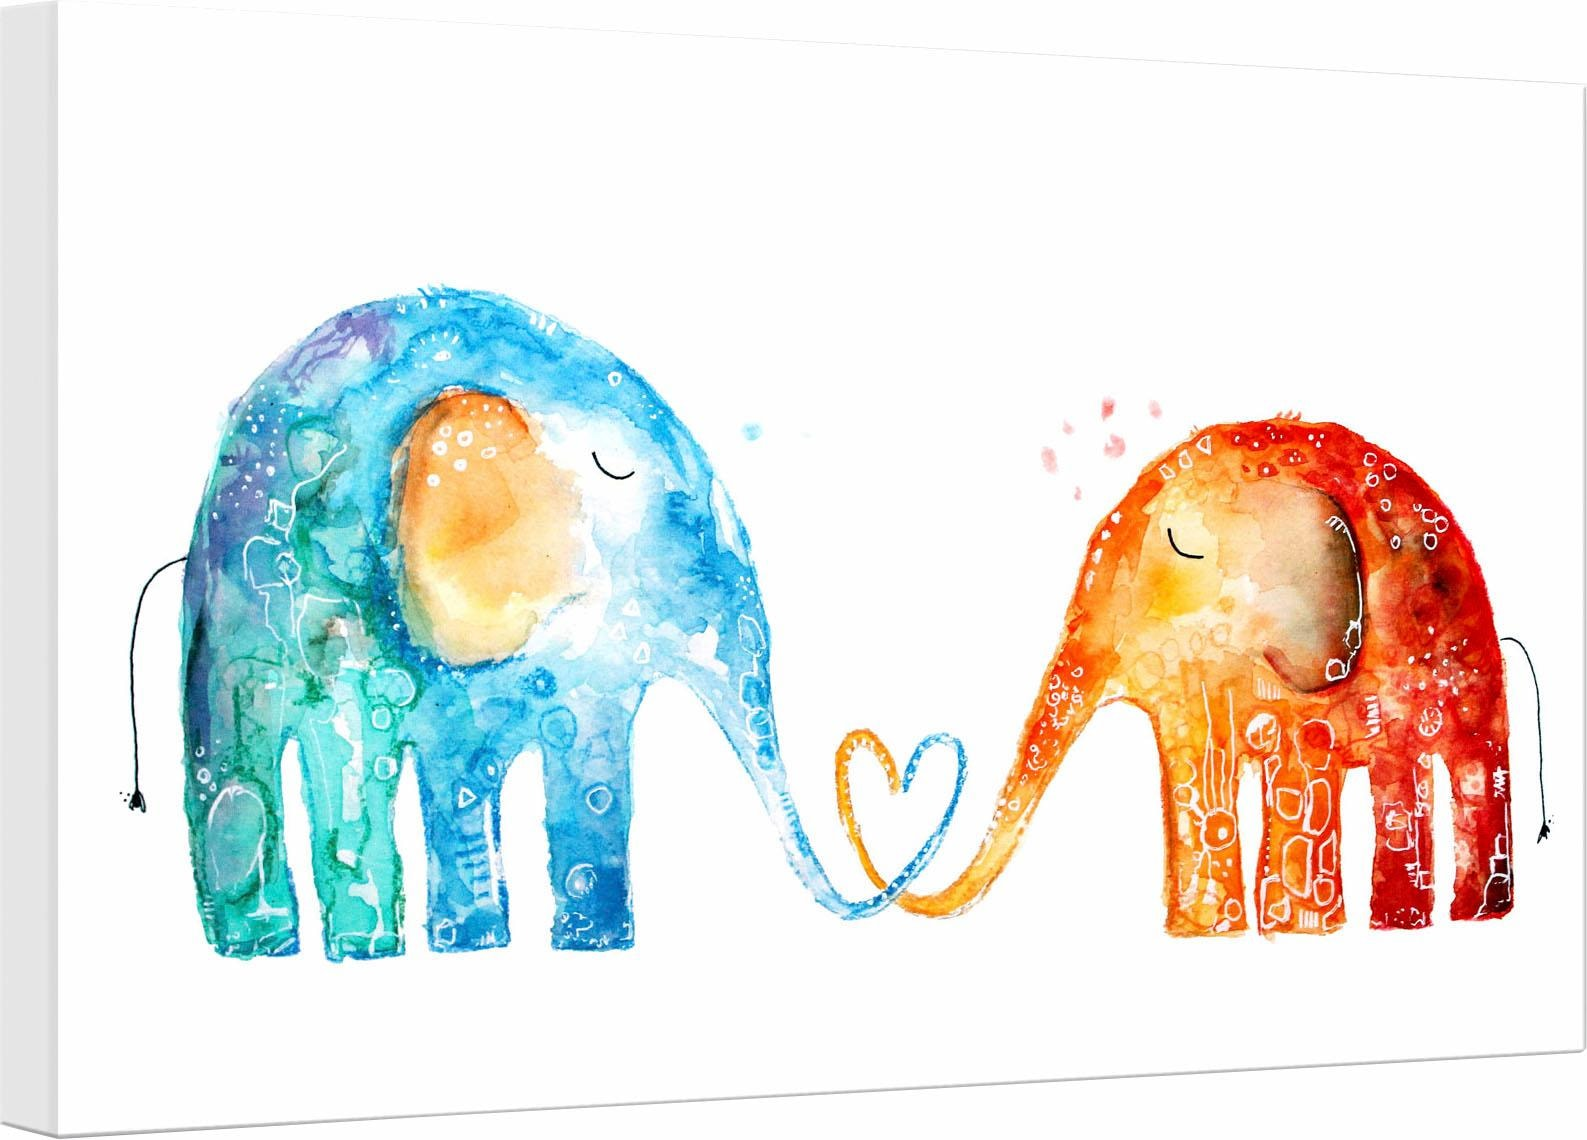 Leinwandbild Hagenmeyer - Elefantenliebe Elefanten Wohnen/Accessoires & Leuchten/Wohnaccessoires/Bilder & Bilderrahmen/Leinwandbilder